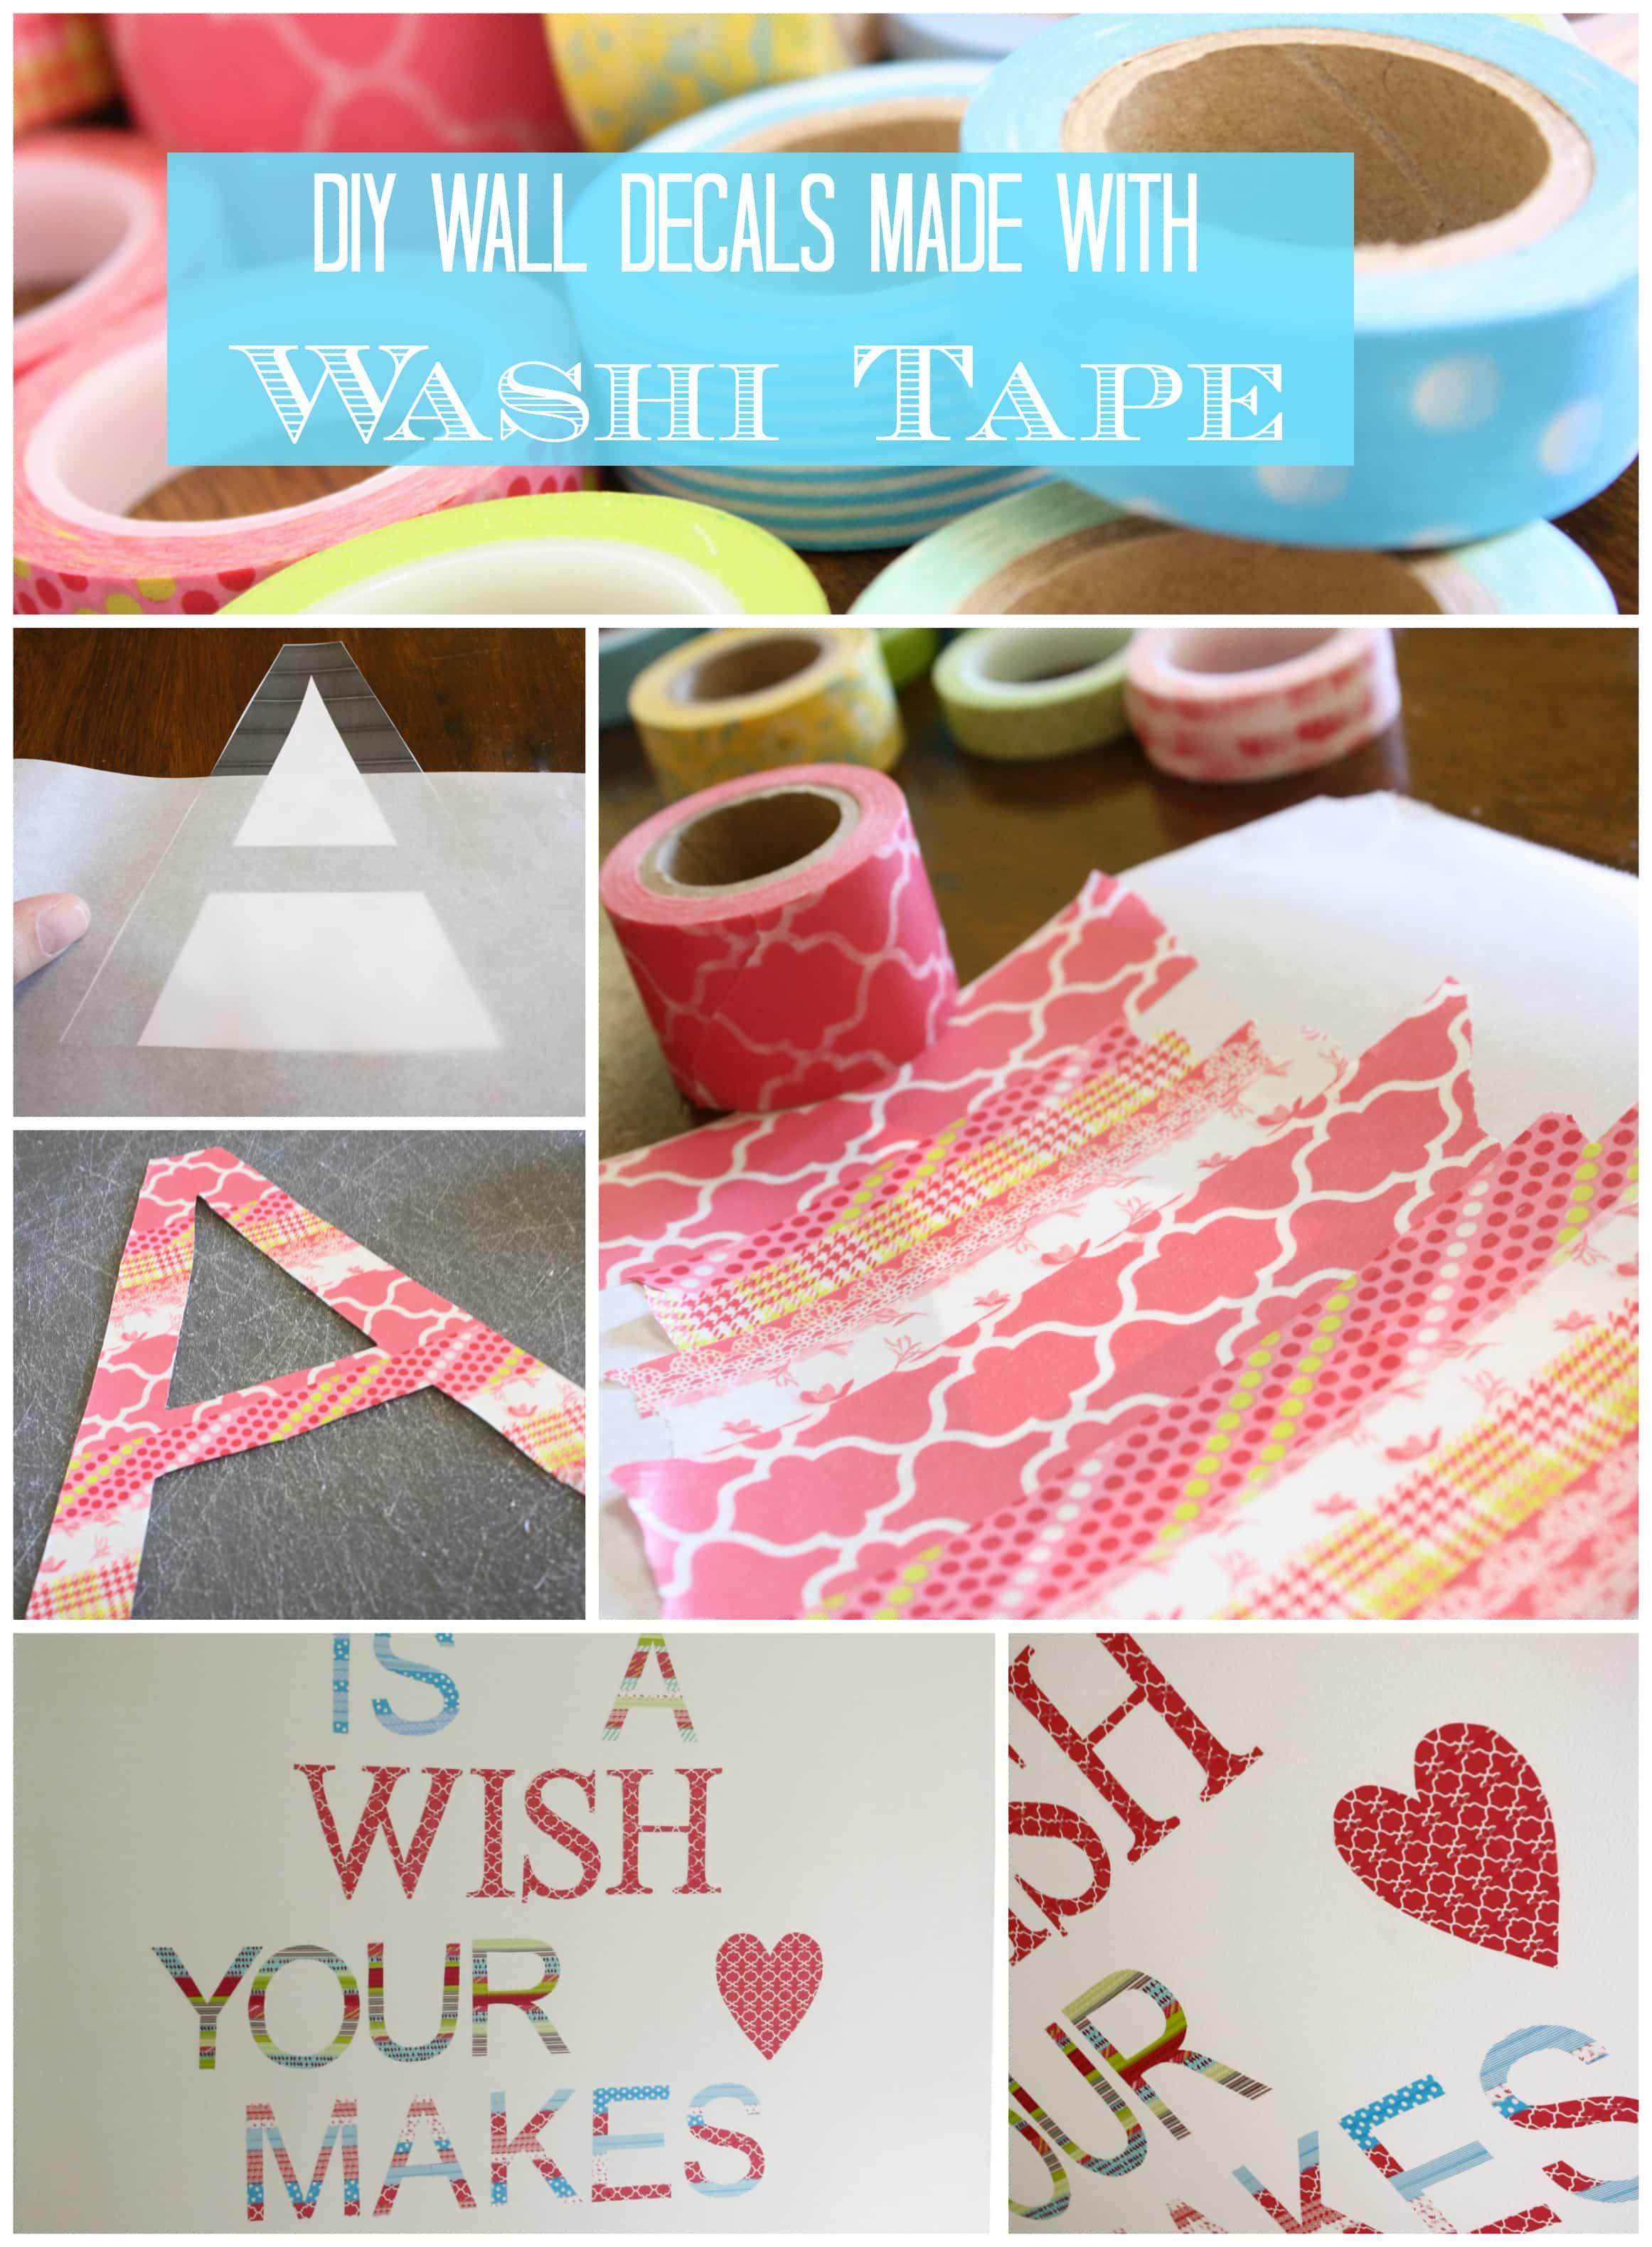 DIY Washi Tape Wall Decals